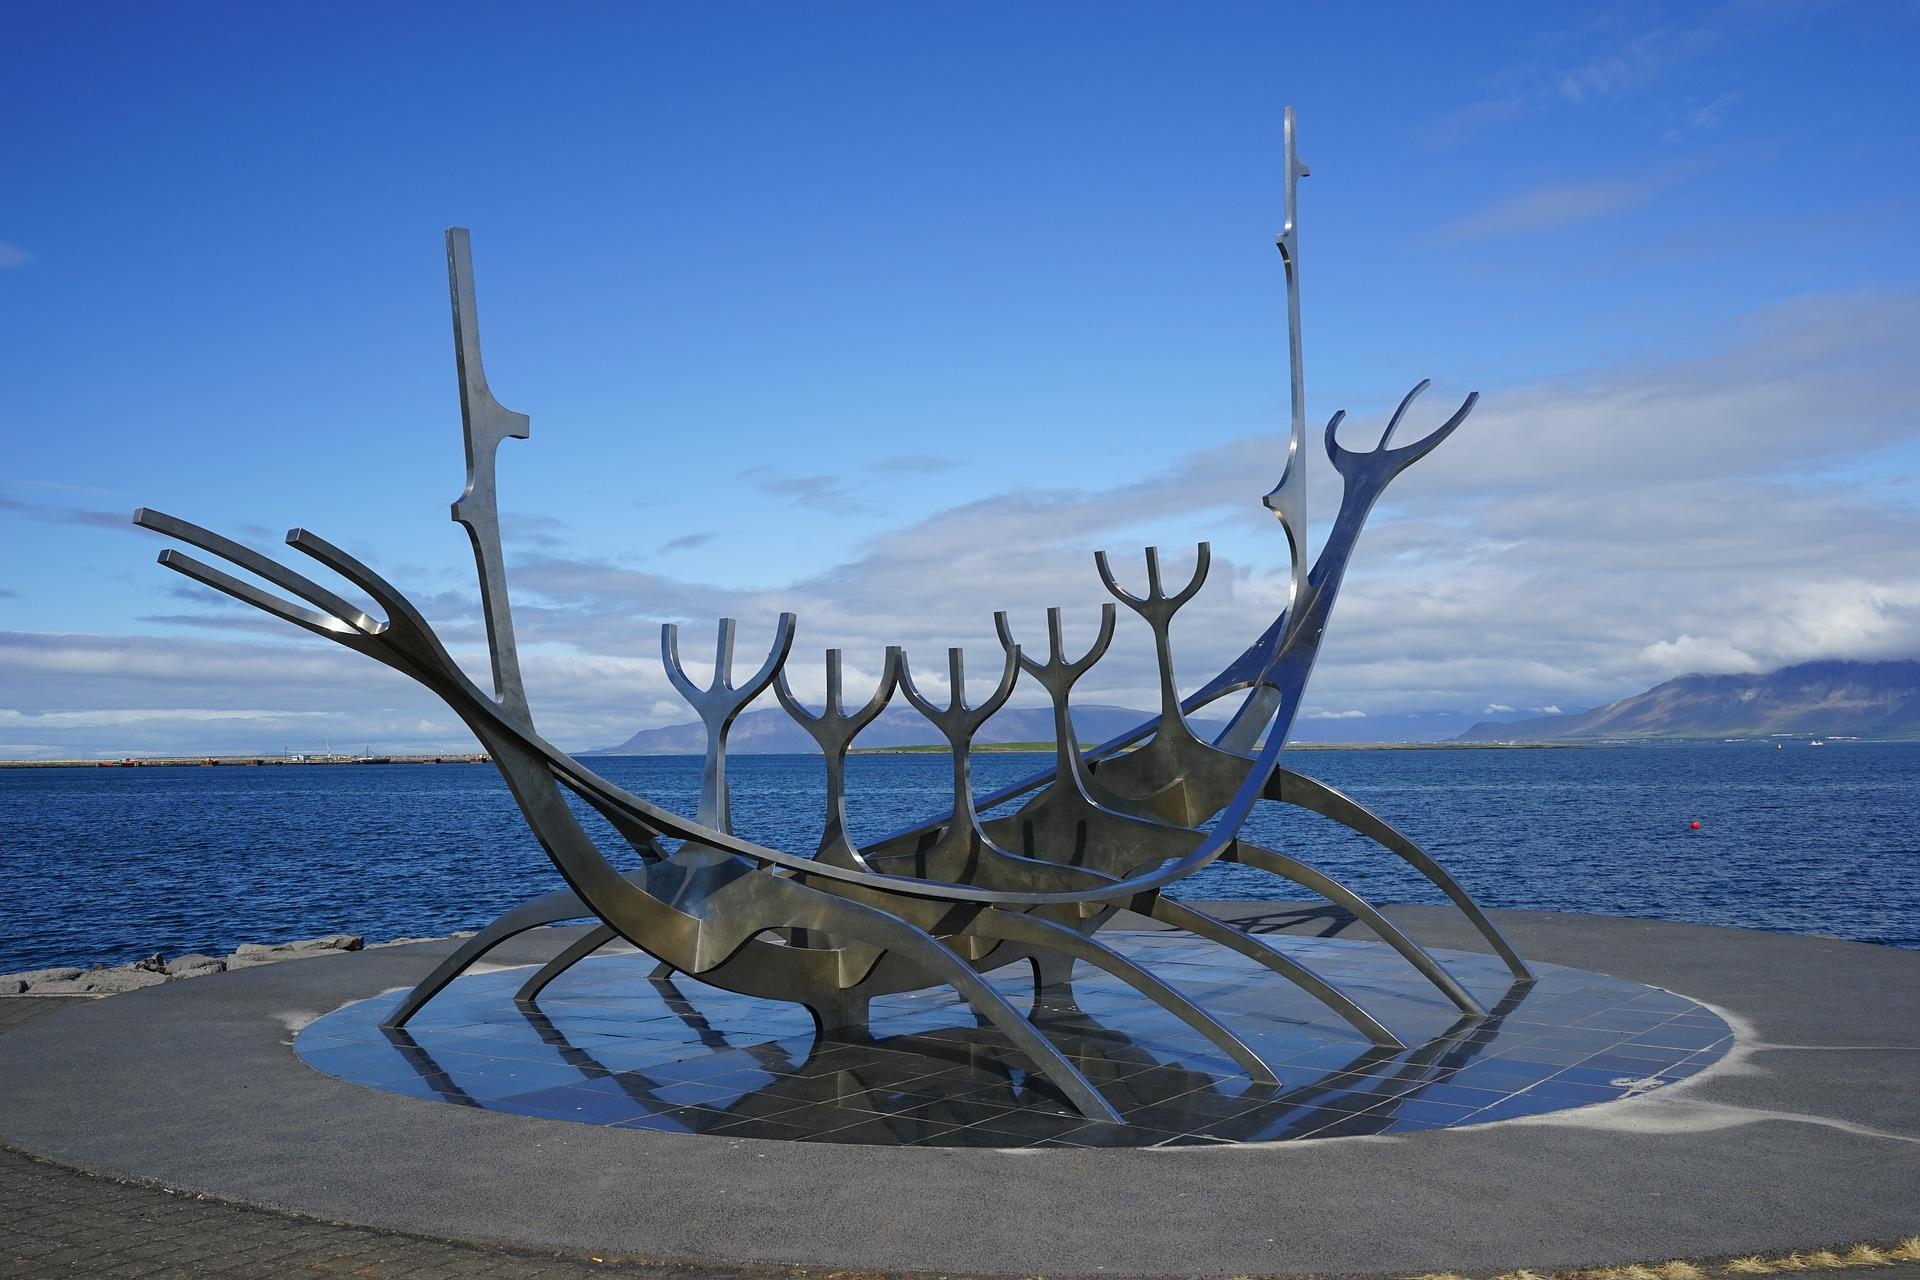 Sólfarið (The Sun Voyager) in Reykjavik, Iceland